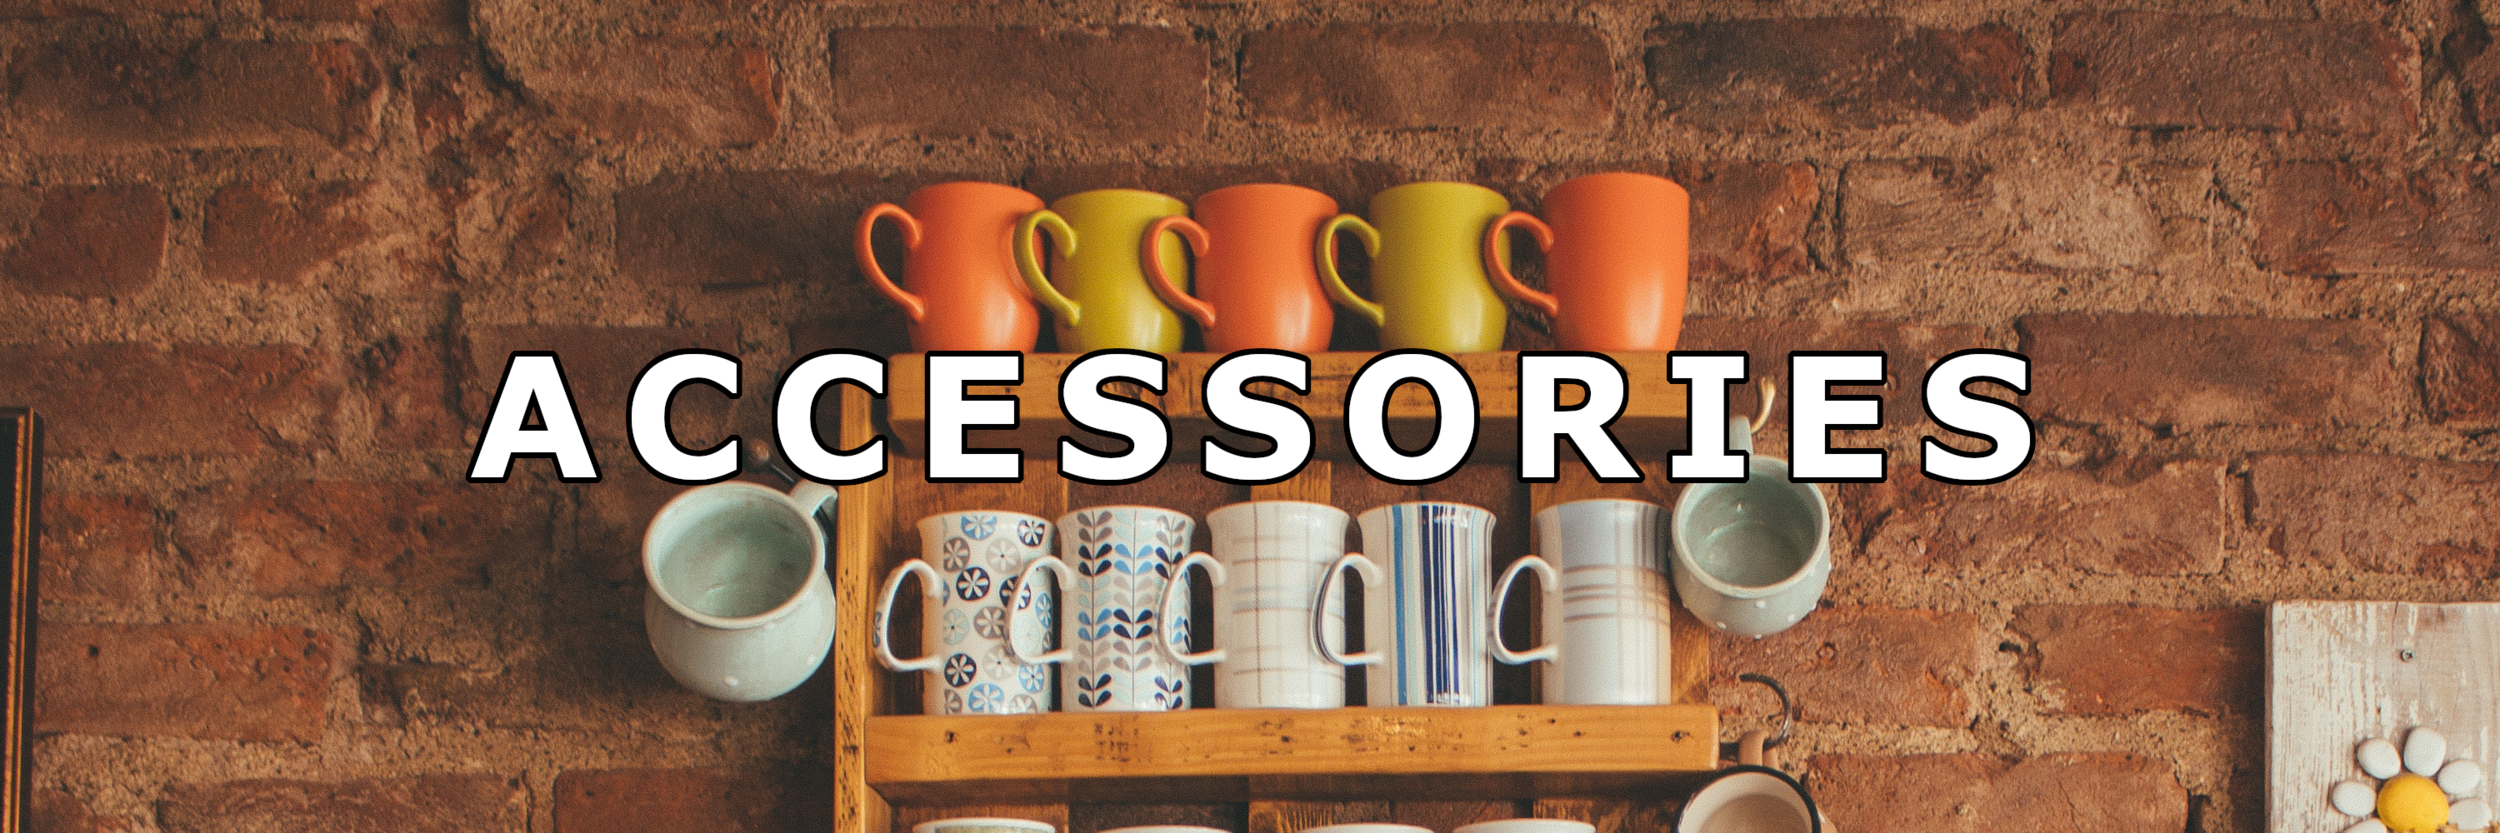 website_accessories.png